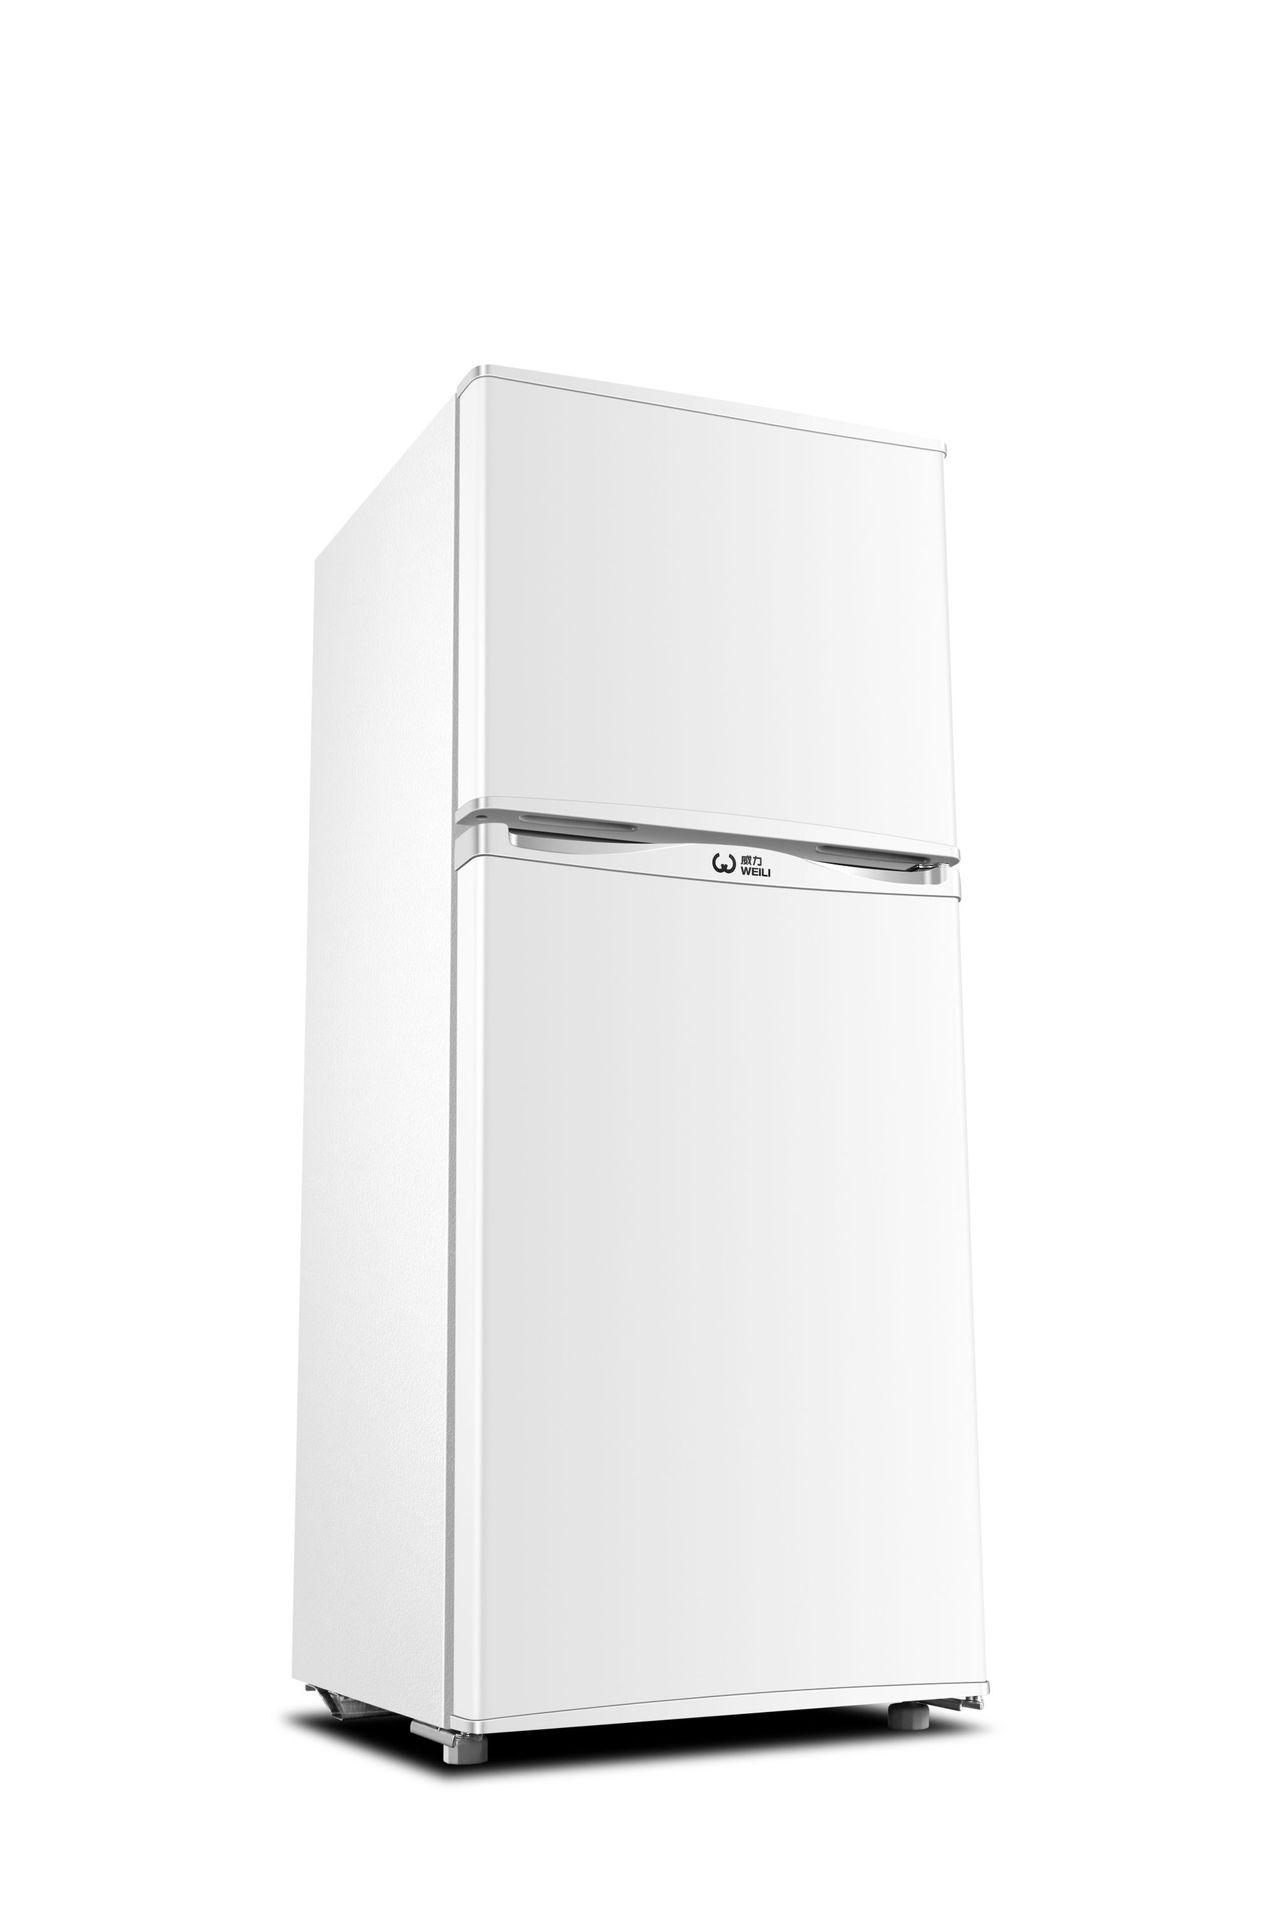 WEILI Tủ lạnh mini cửa đôi WEILI BCD-126W Tủ lạnh nhỏ gia dụng